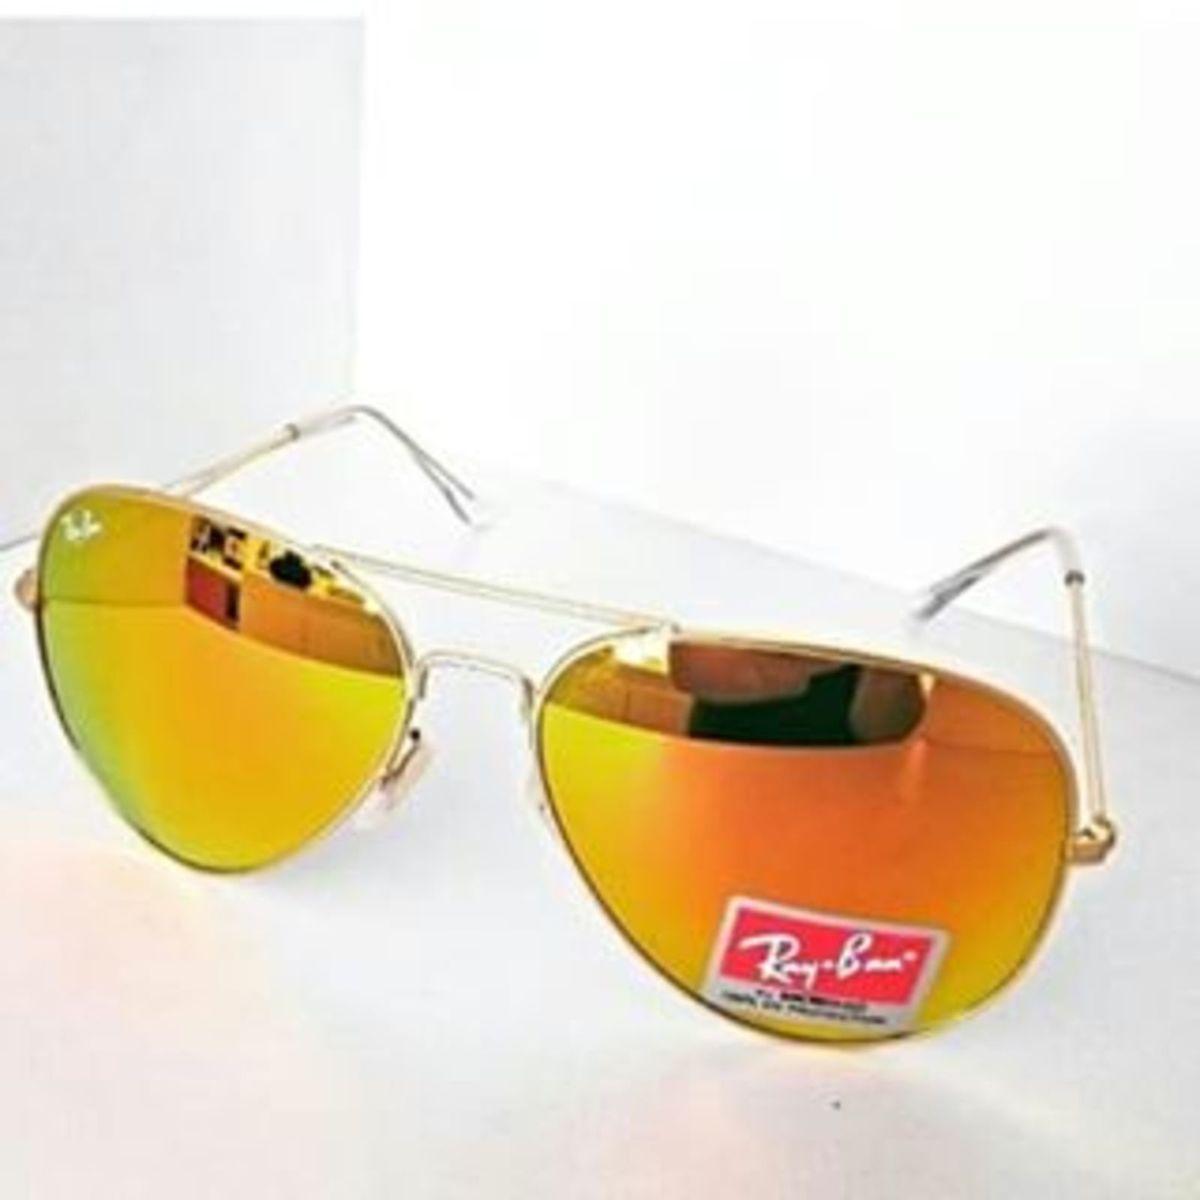 a13081bf0 Óculos Ray Ban Aviador Laranja Espelhado Rb3026 | Óculos Feminino Ray Ban  Nunca Usado 15308517 | enjoei